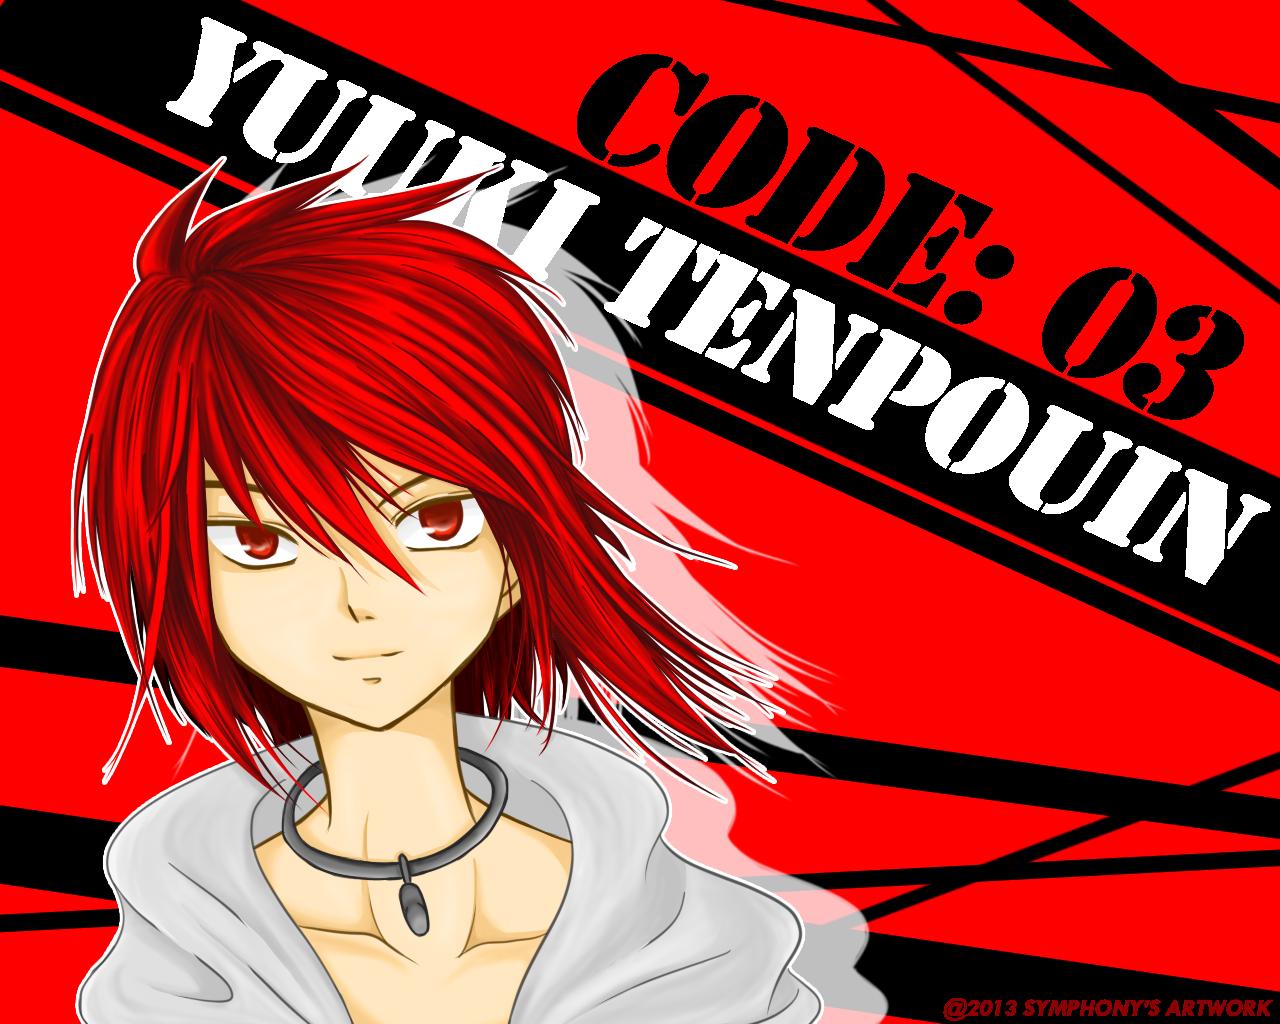 Code Breaker 03 Yuuki Tenpouin by kaidoumi 1280x1024